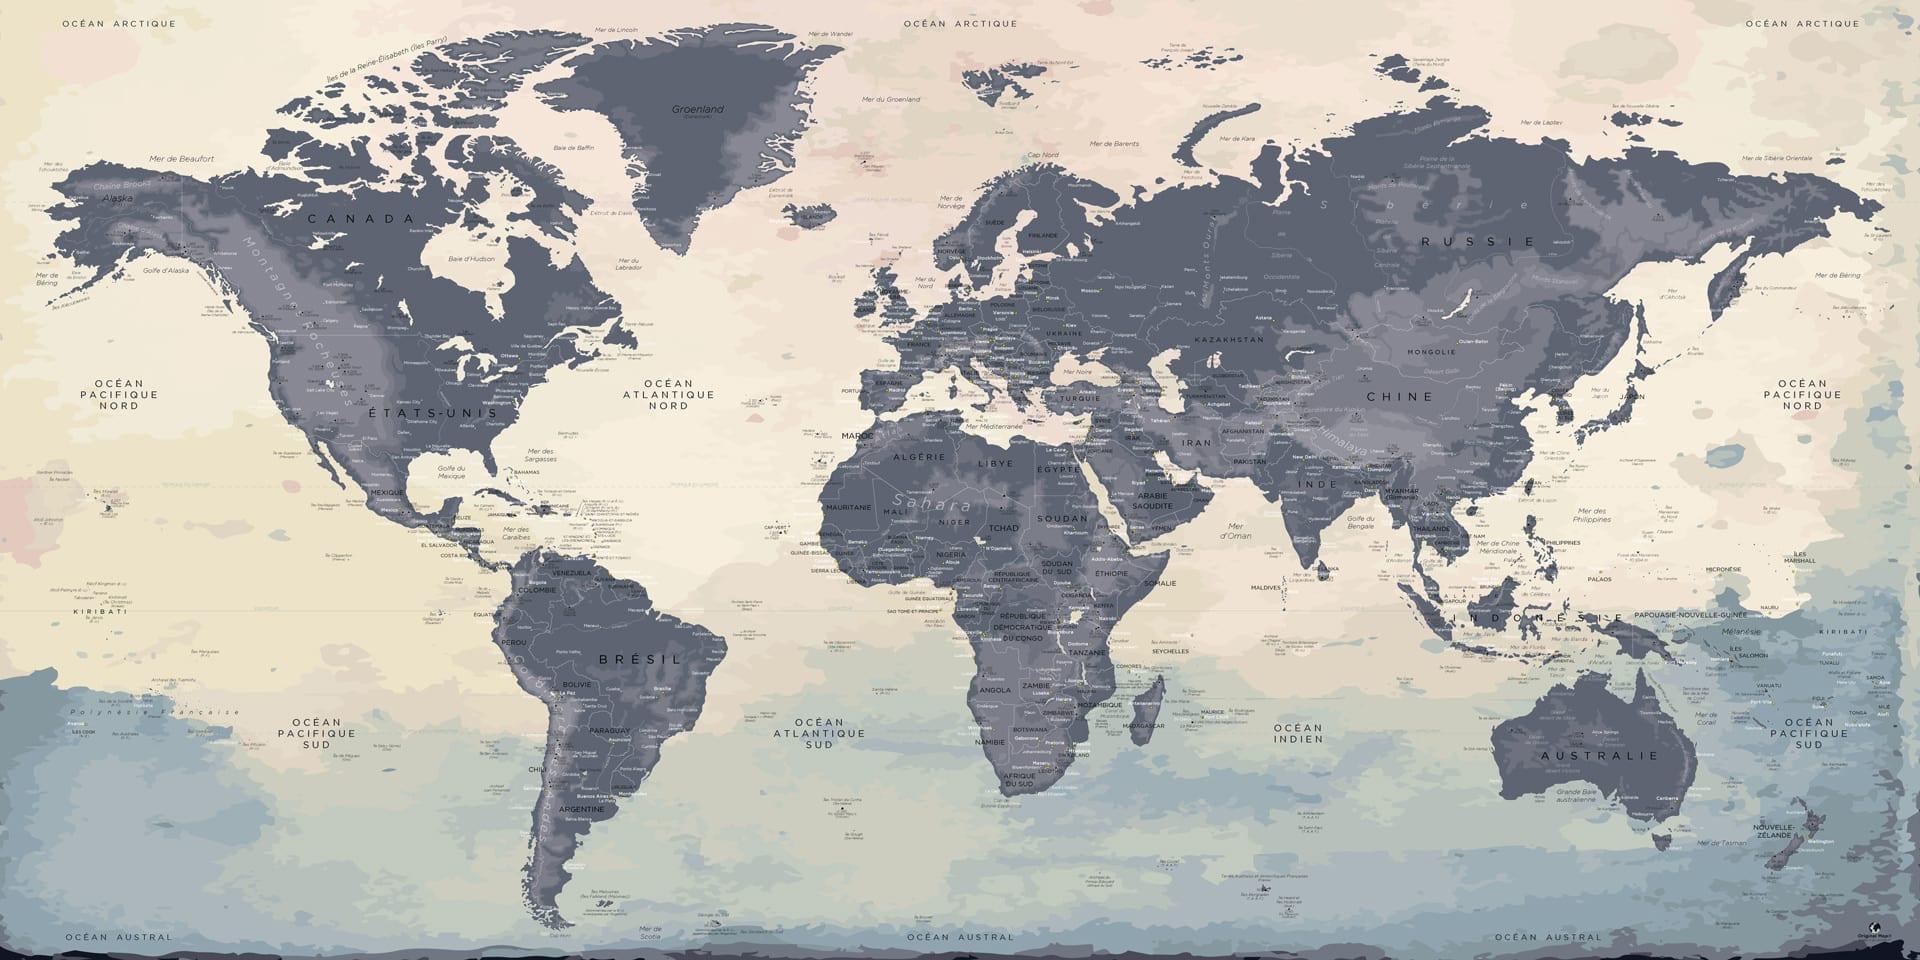 carte monde xxl mappemonde xxl carte g ante original map. Black Bedroom Furniture Sets. Home Design Ideas